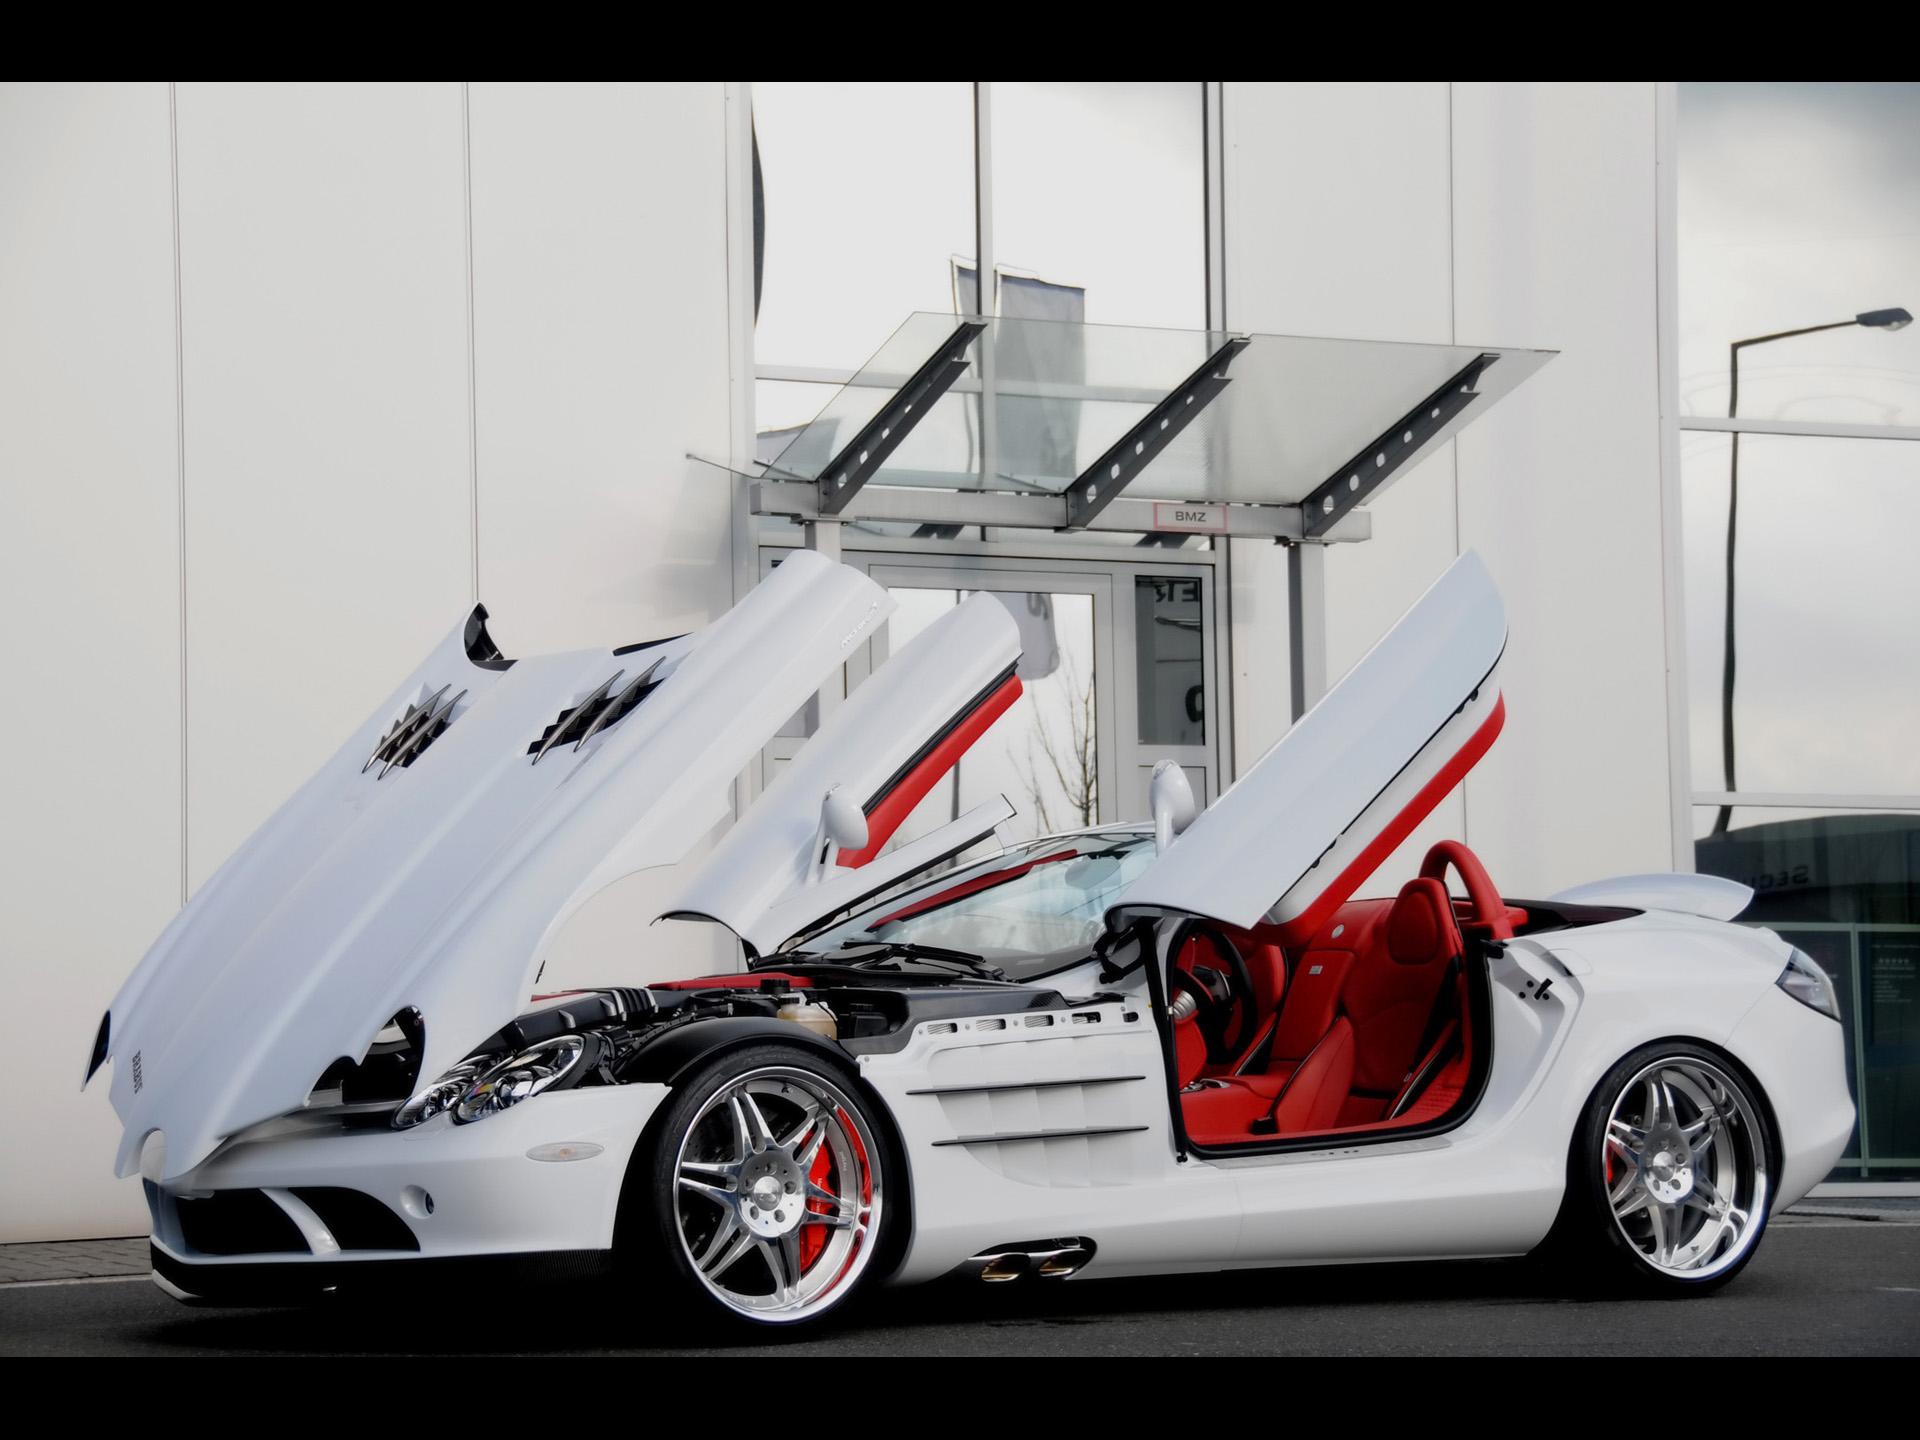 Fast Cars: Brabus Cars